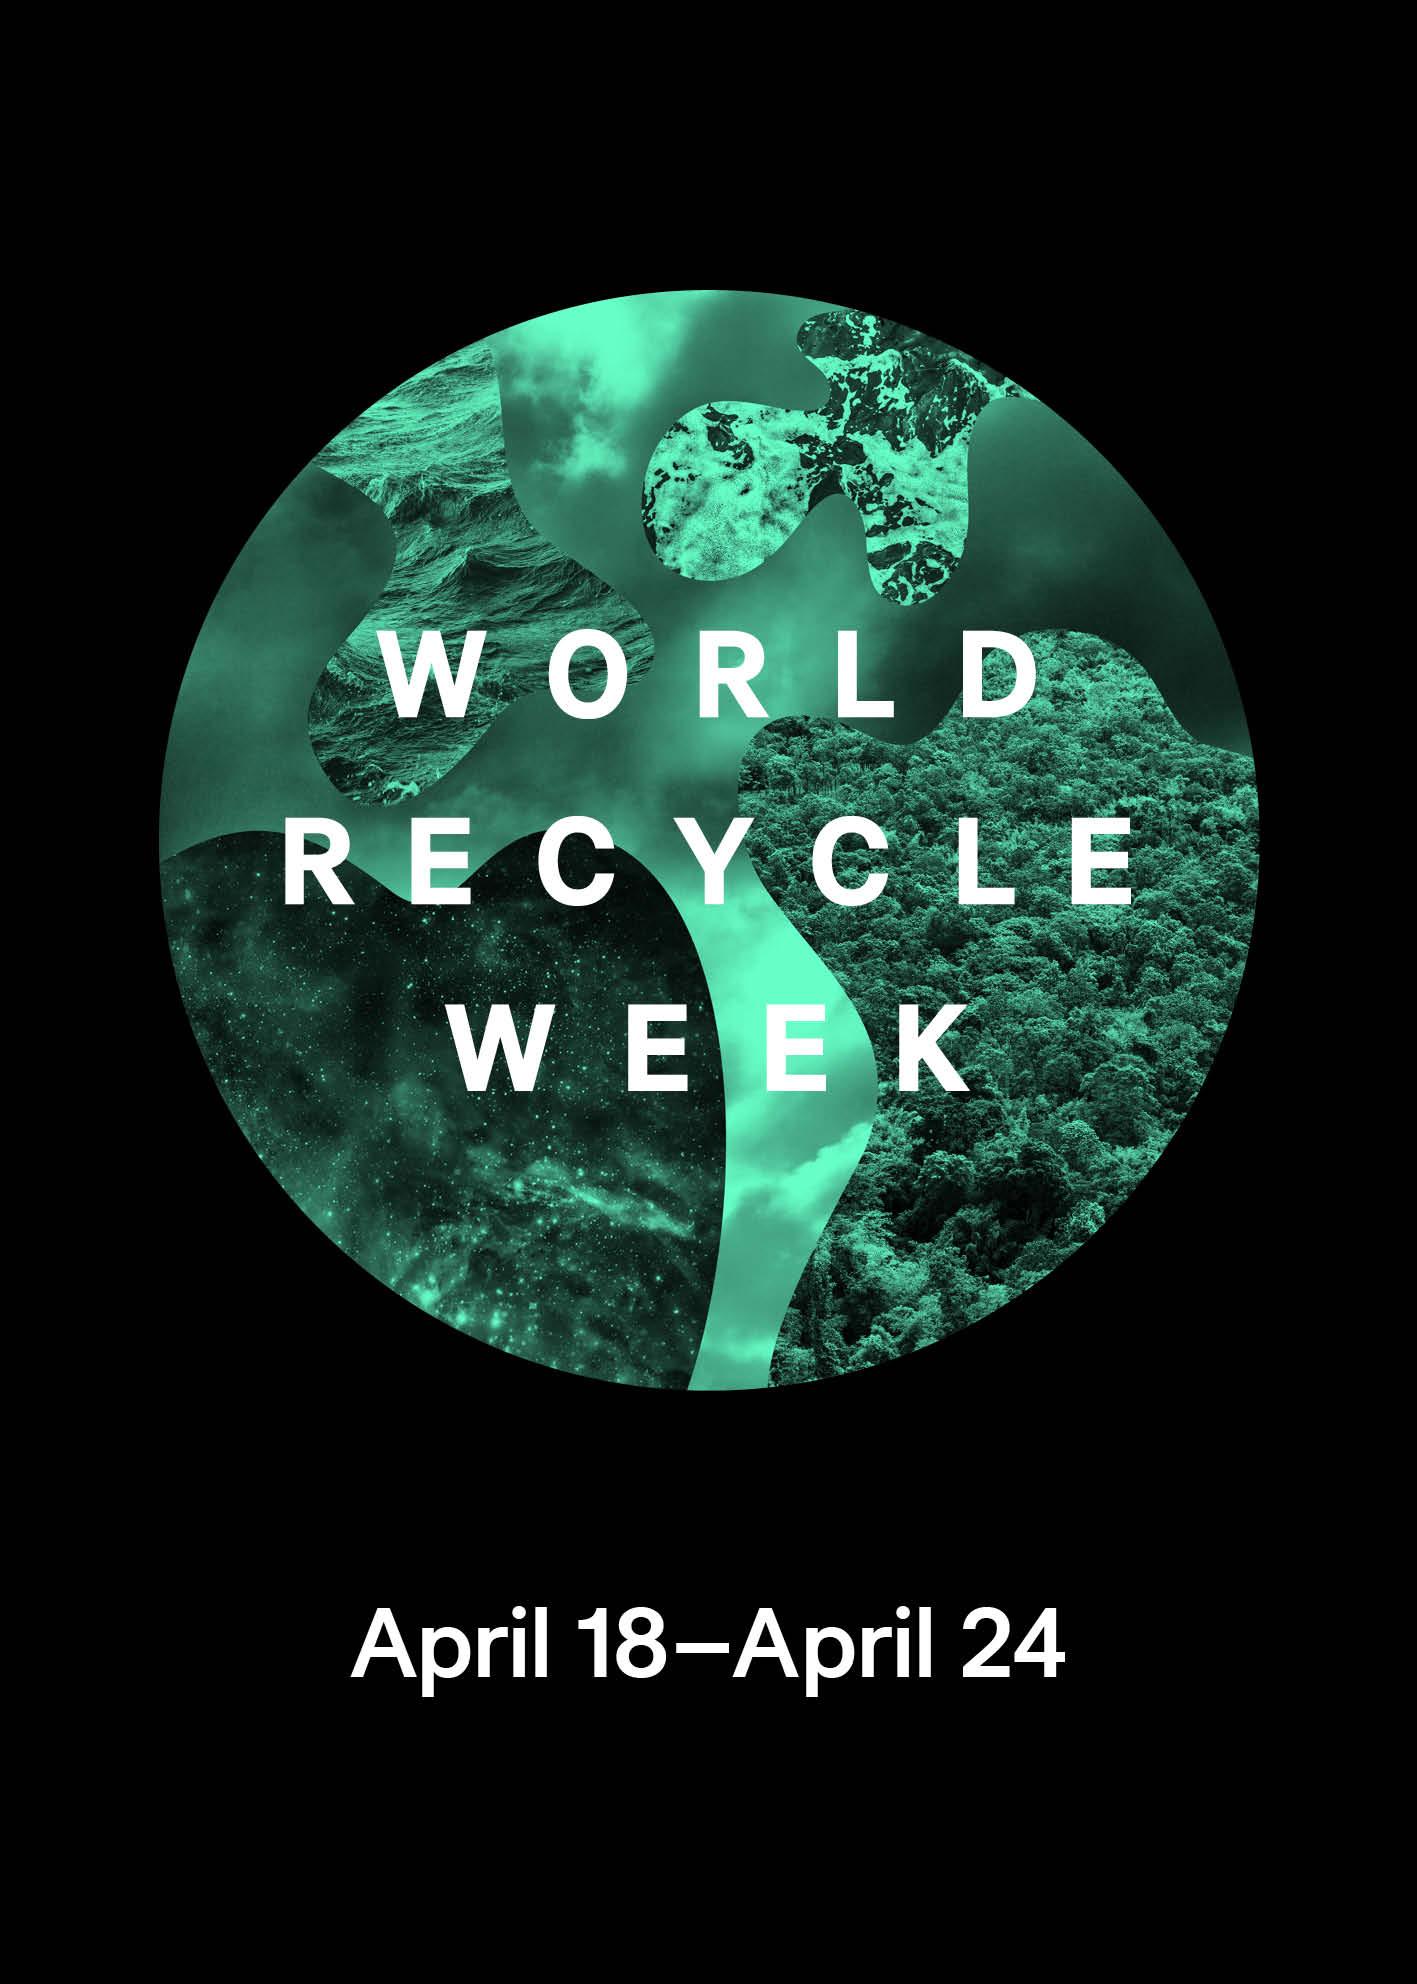 harpers-bazaar-malaysia-h&m-world-recycle-week